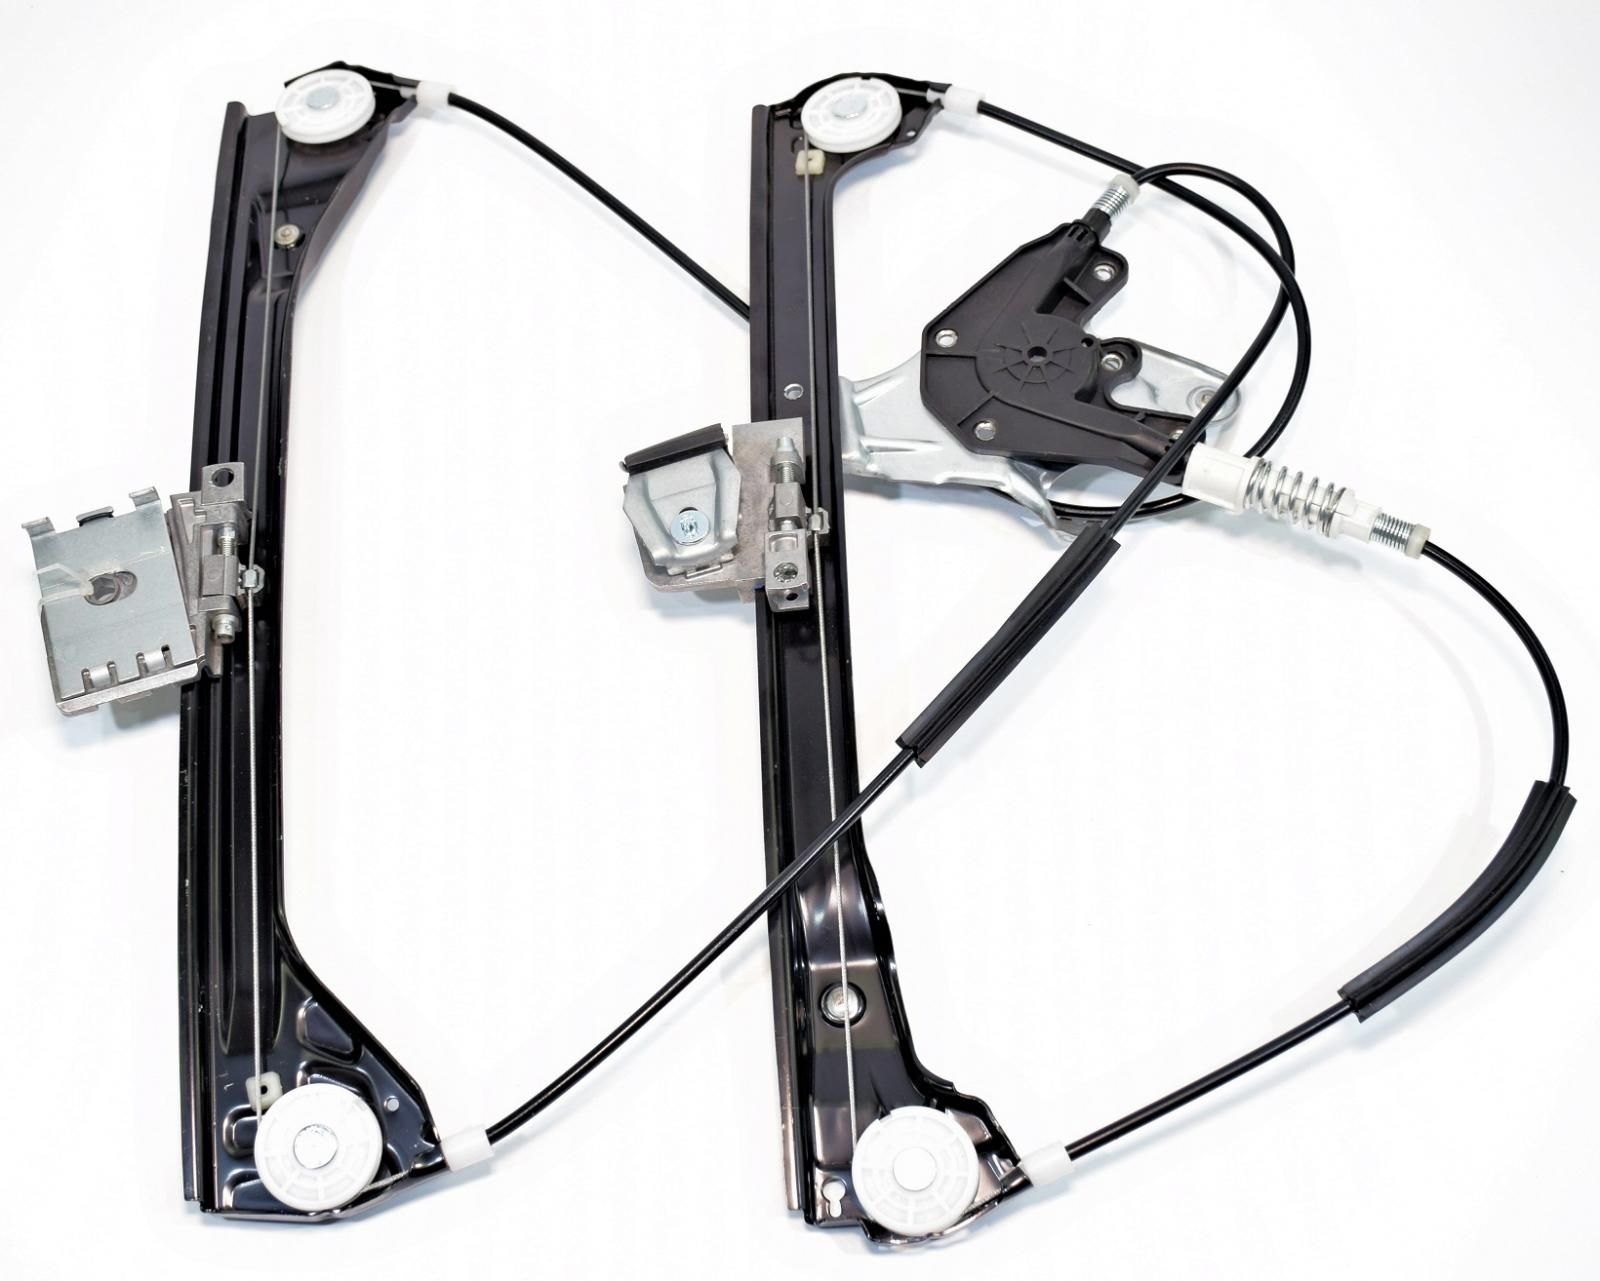 Elevalunas Delantero Bmw Serie 3 E46 Coupe Mecanismo Puerta